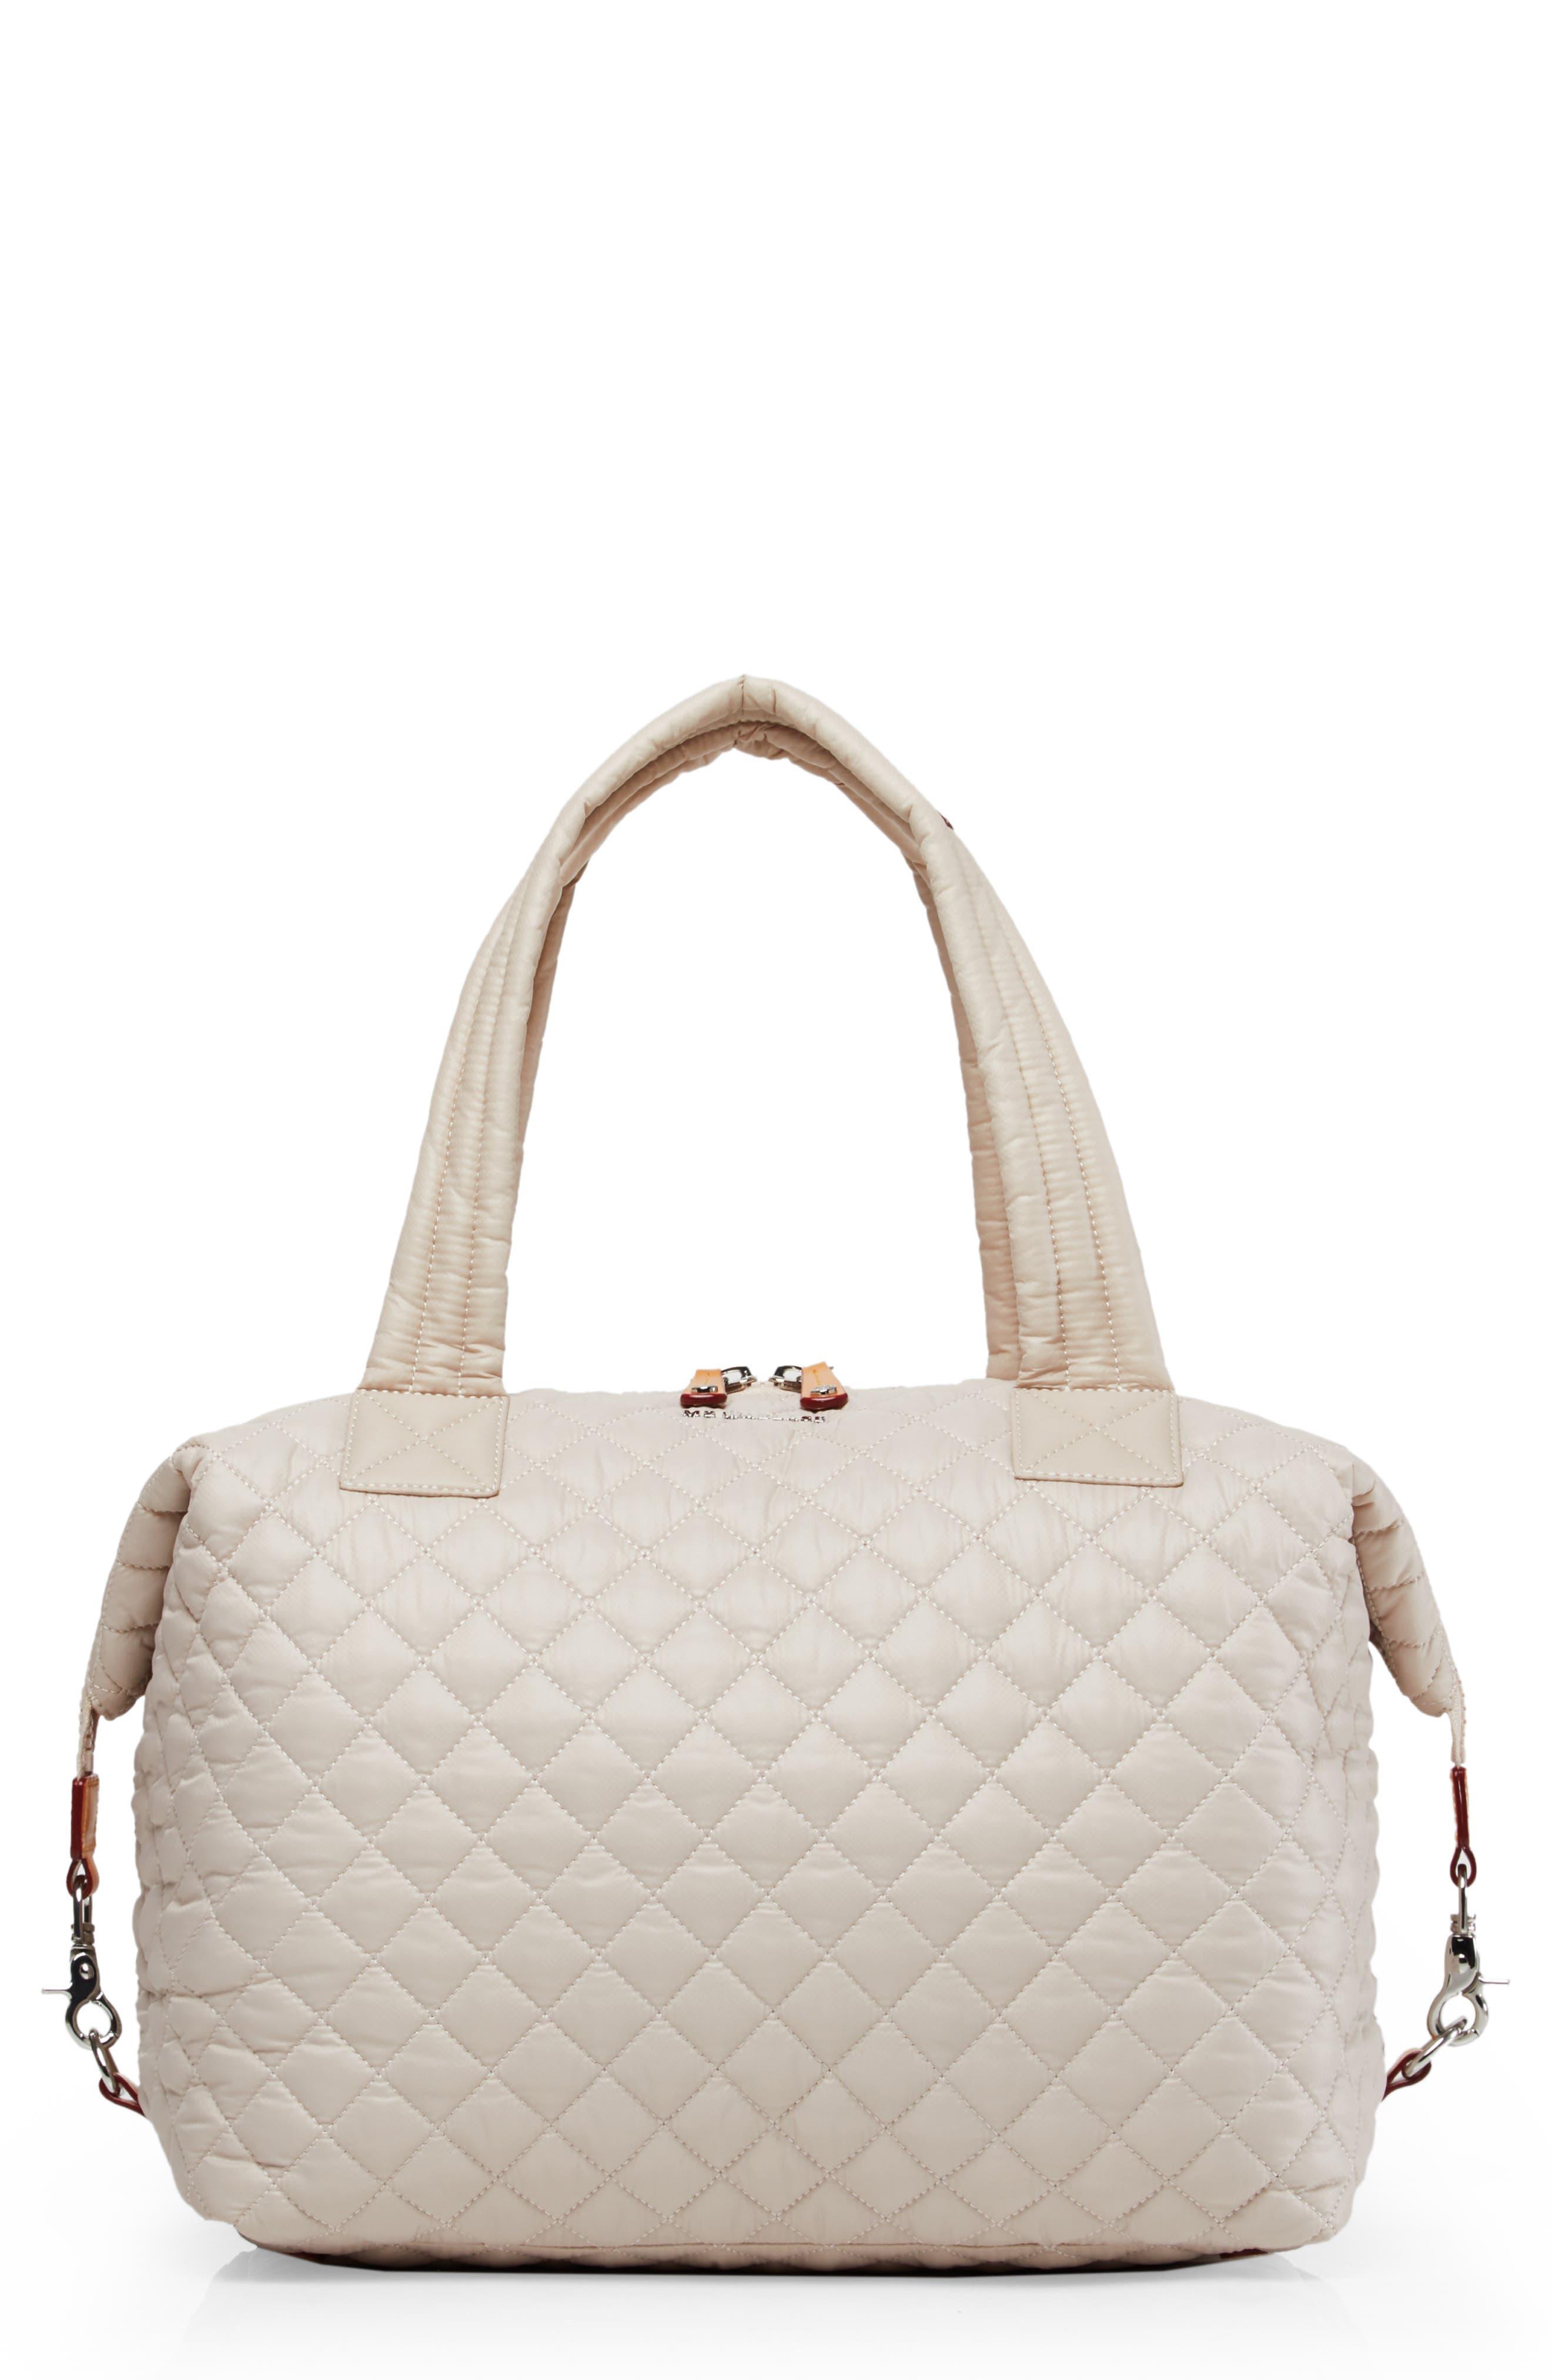 mz wallace handbags nordstrom rh shop nordstrom com